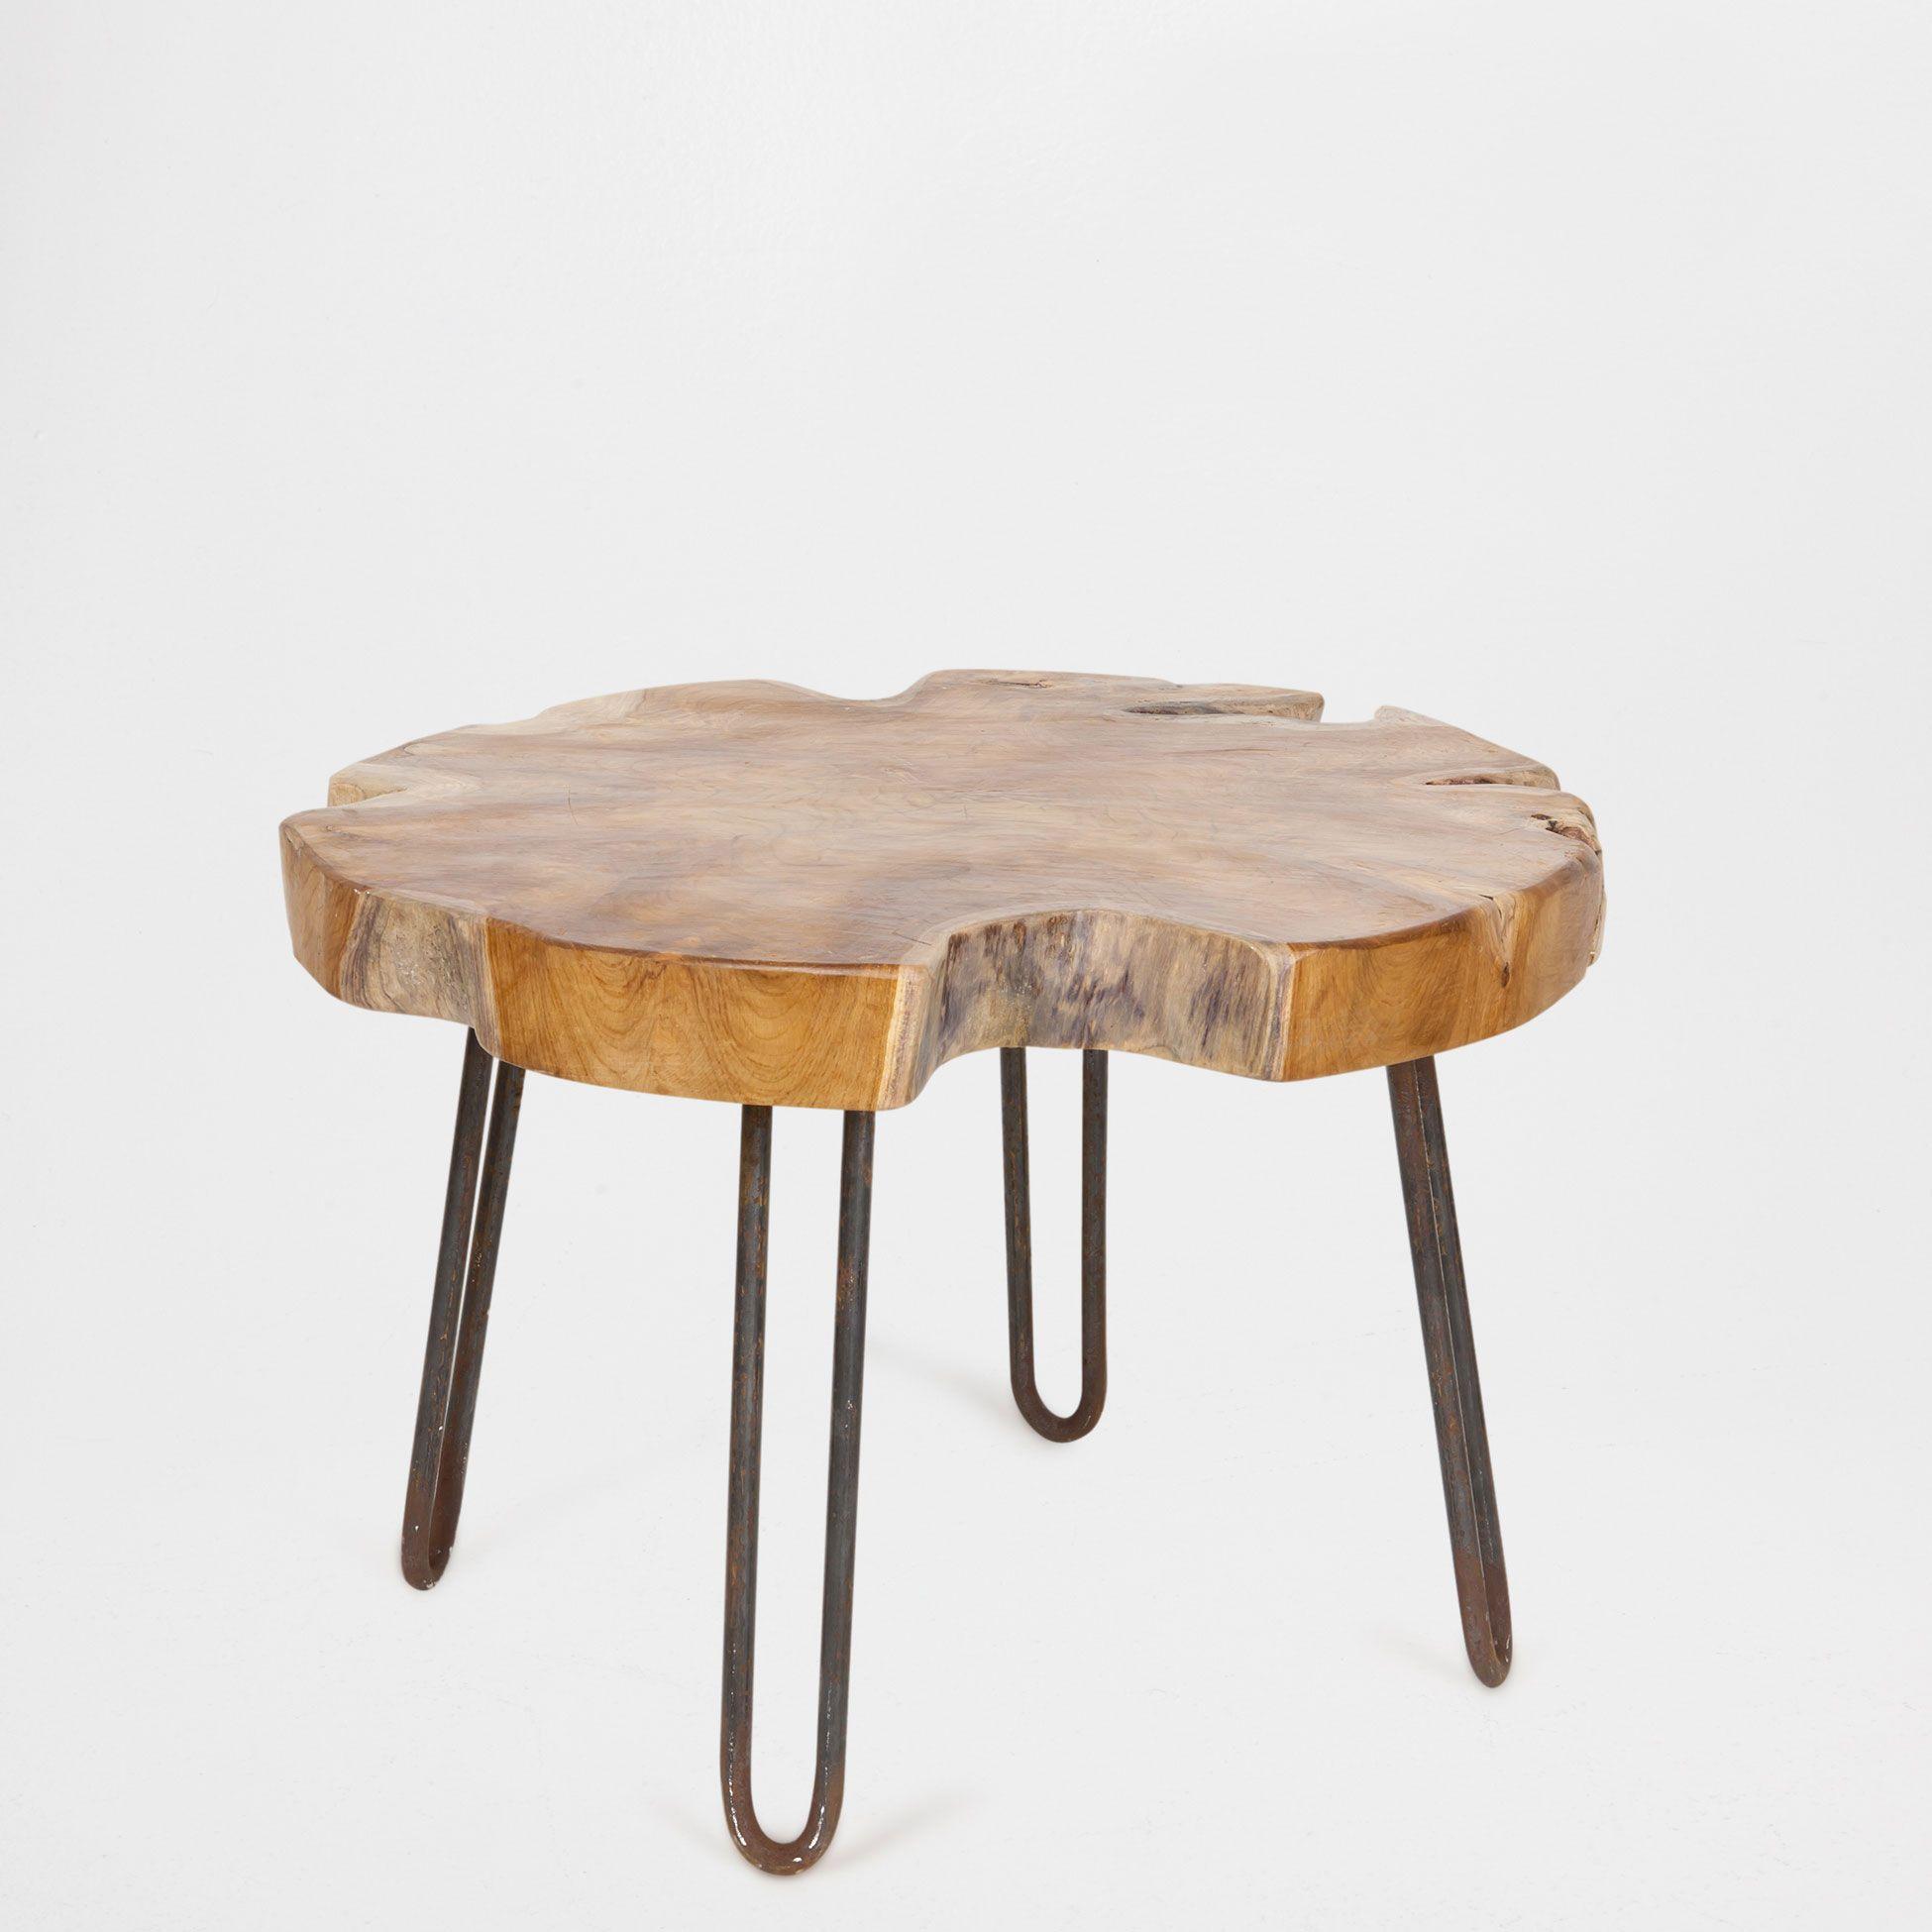 Zara Sofa Table: SMALL TRUNK-SHAPED WOODEN TABLE